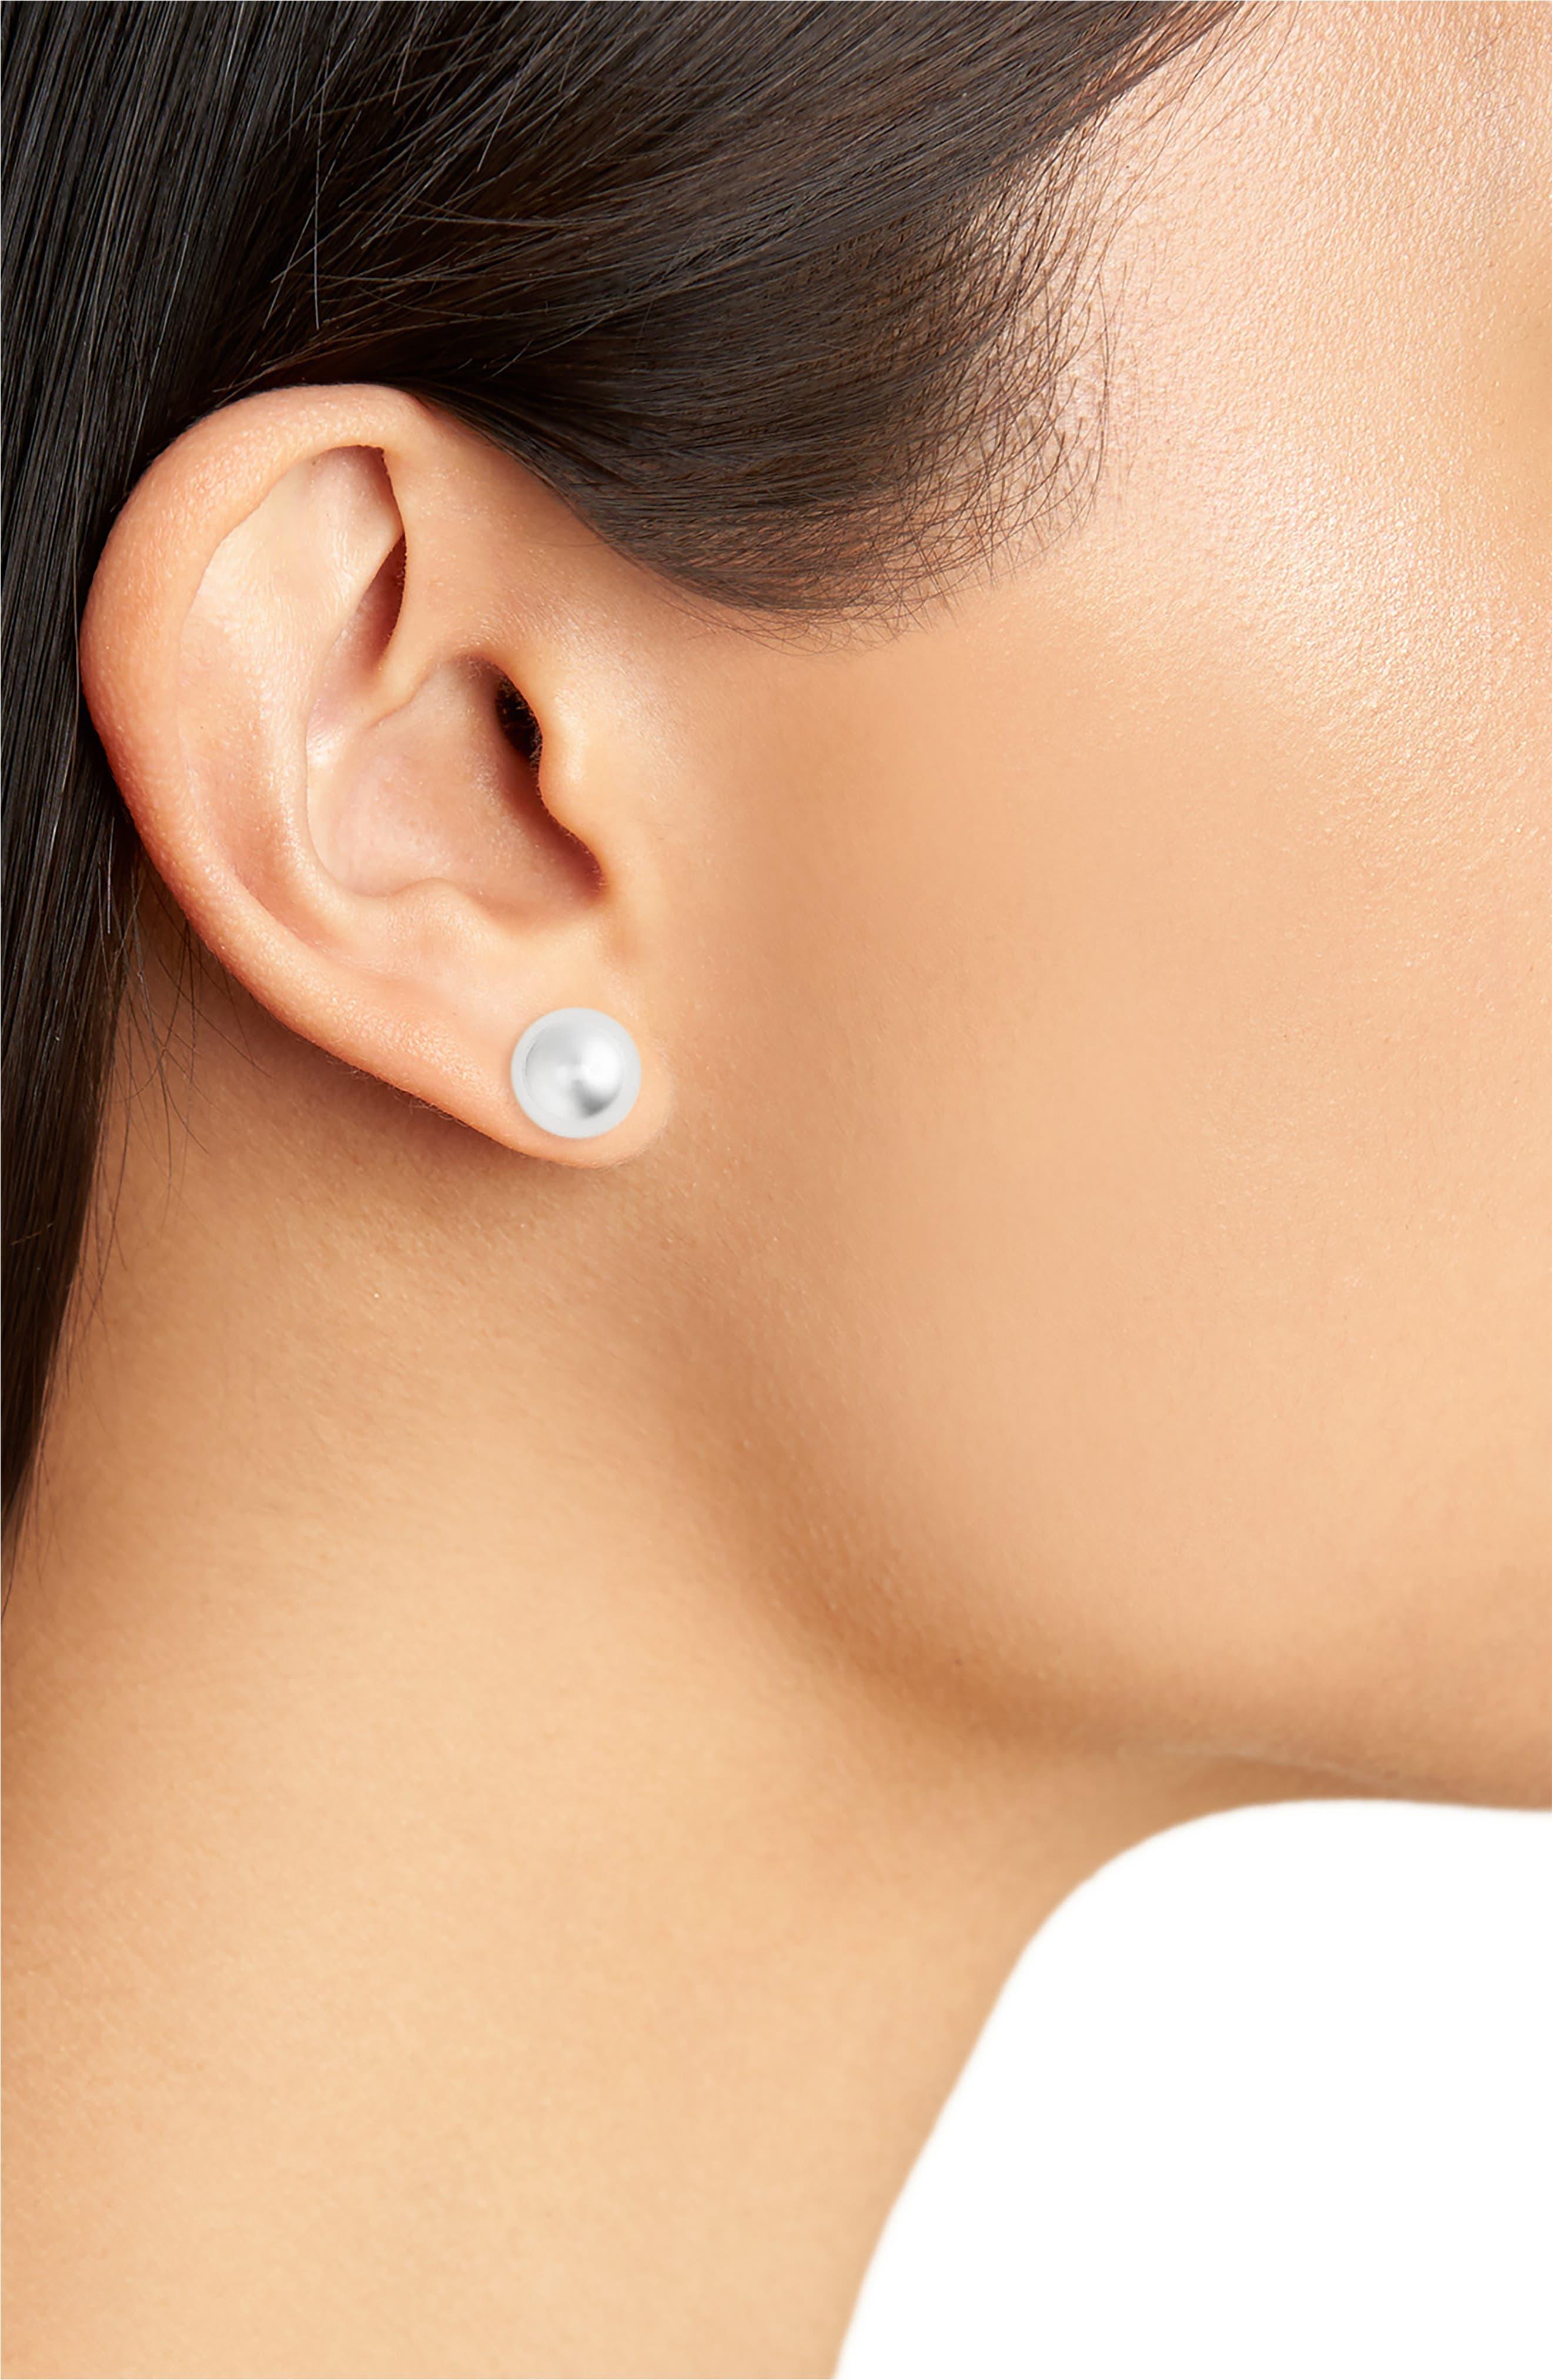 Ball Stud Earrings,                             Alternate thumbnail 2, color,                             SILVER